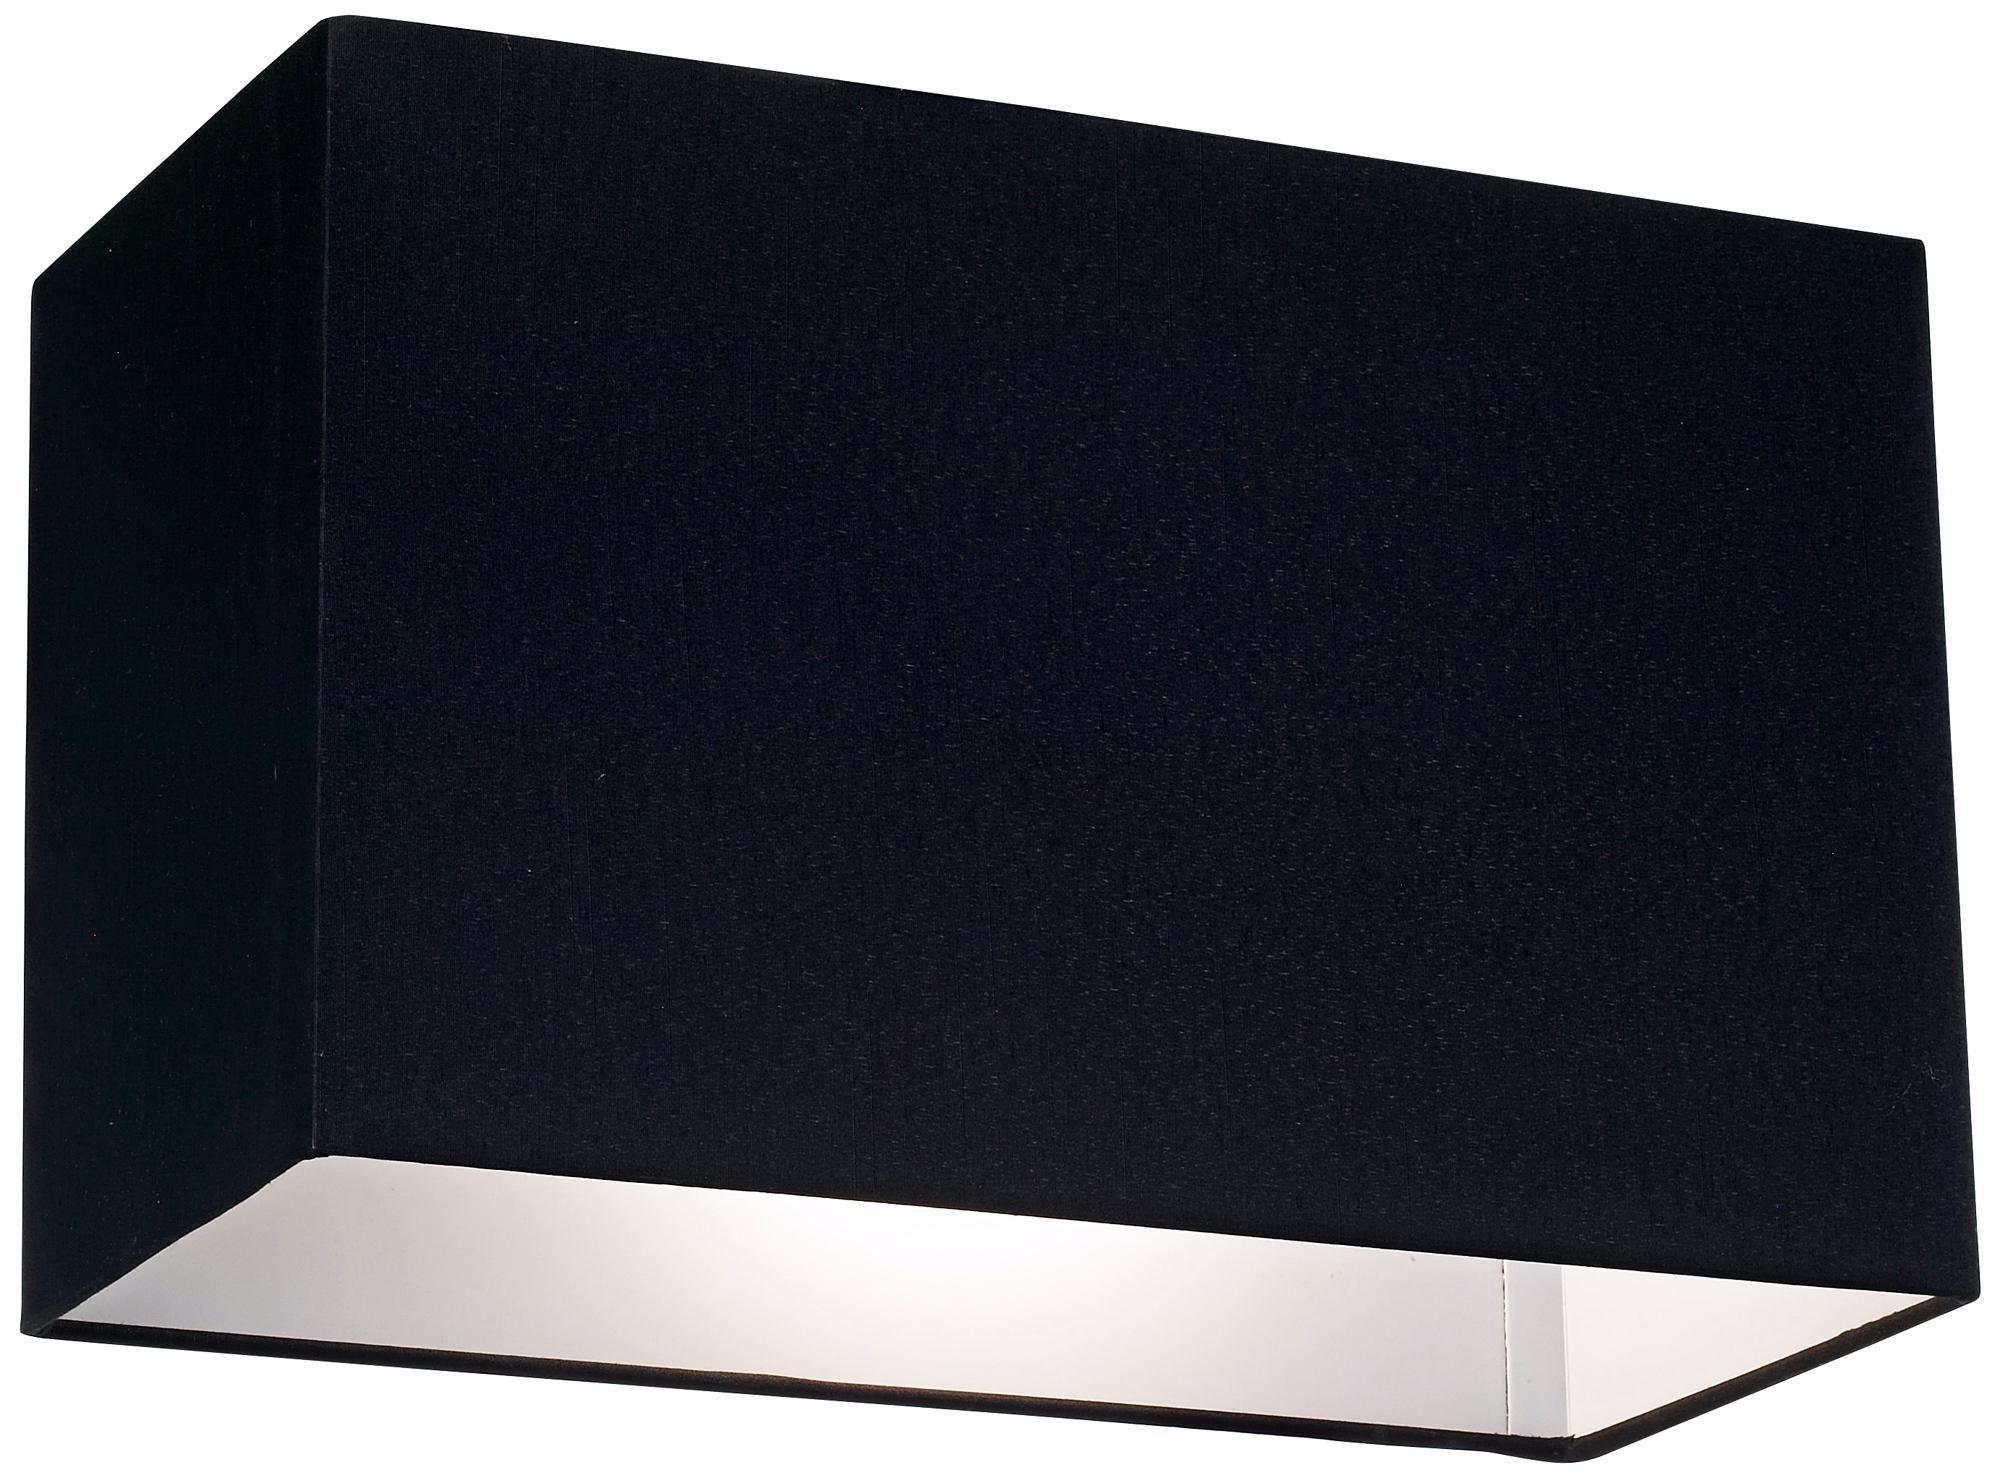 Black rectangular hardback lamp shade 816x816x10 spider style black rectangular hardback lamp shade 816x816x10 spider mozeypictures Image collections